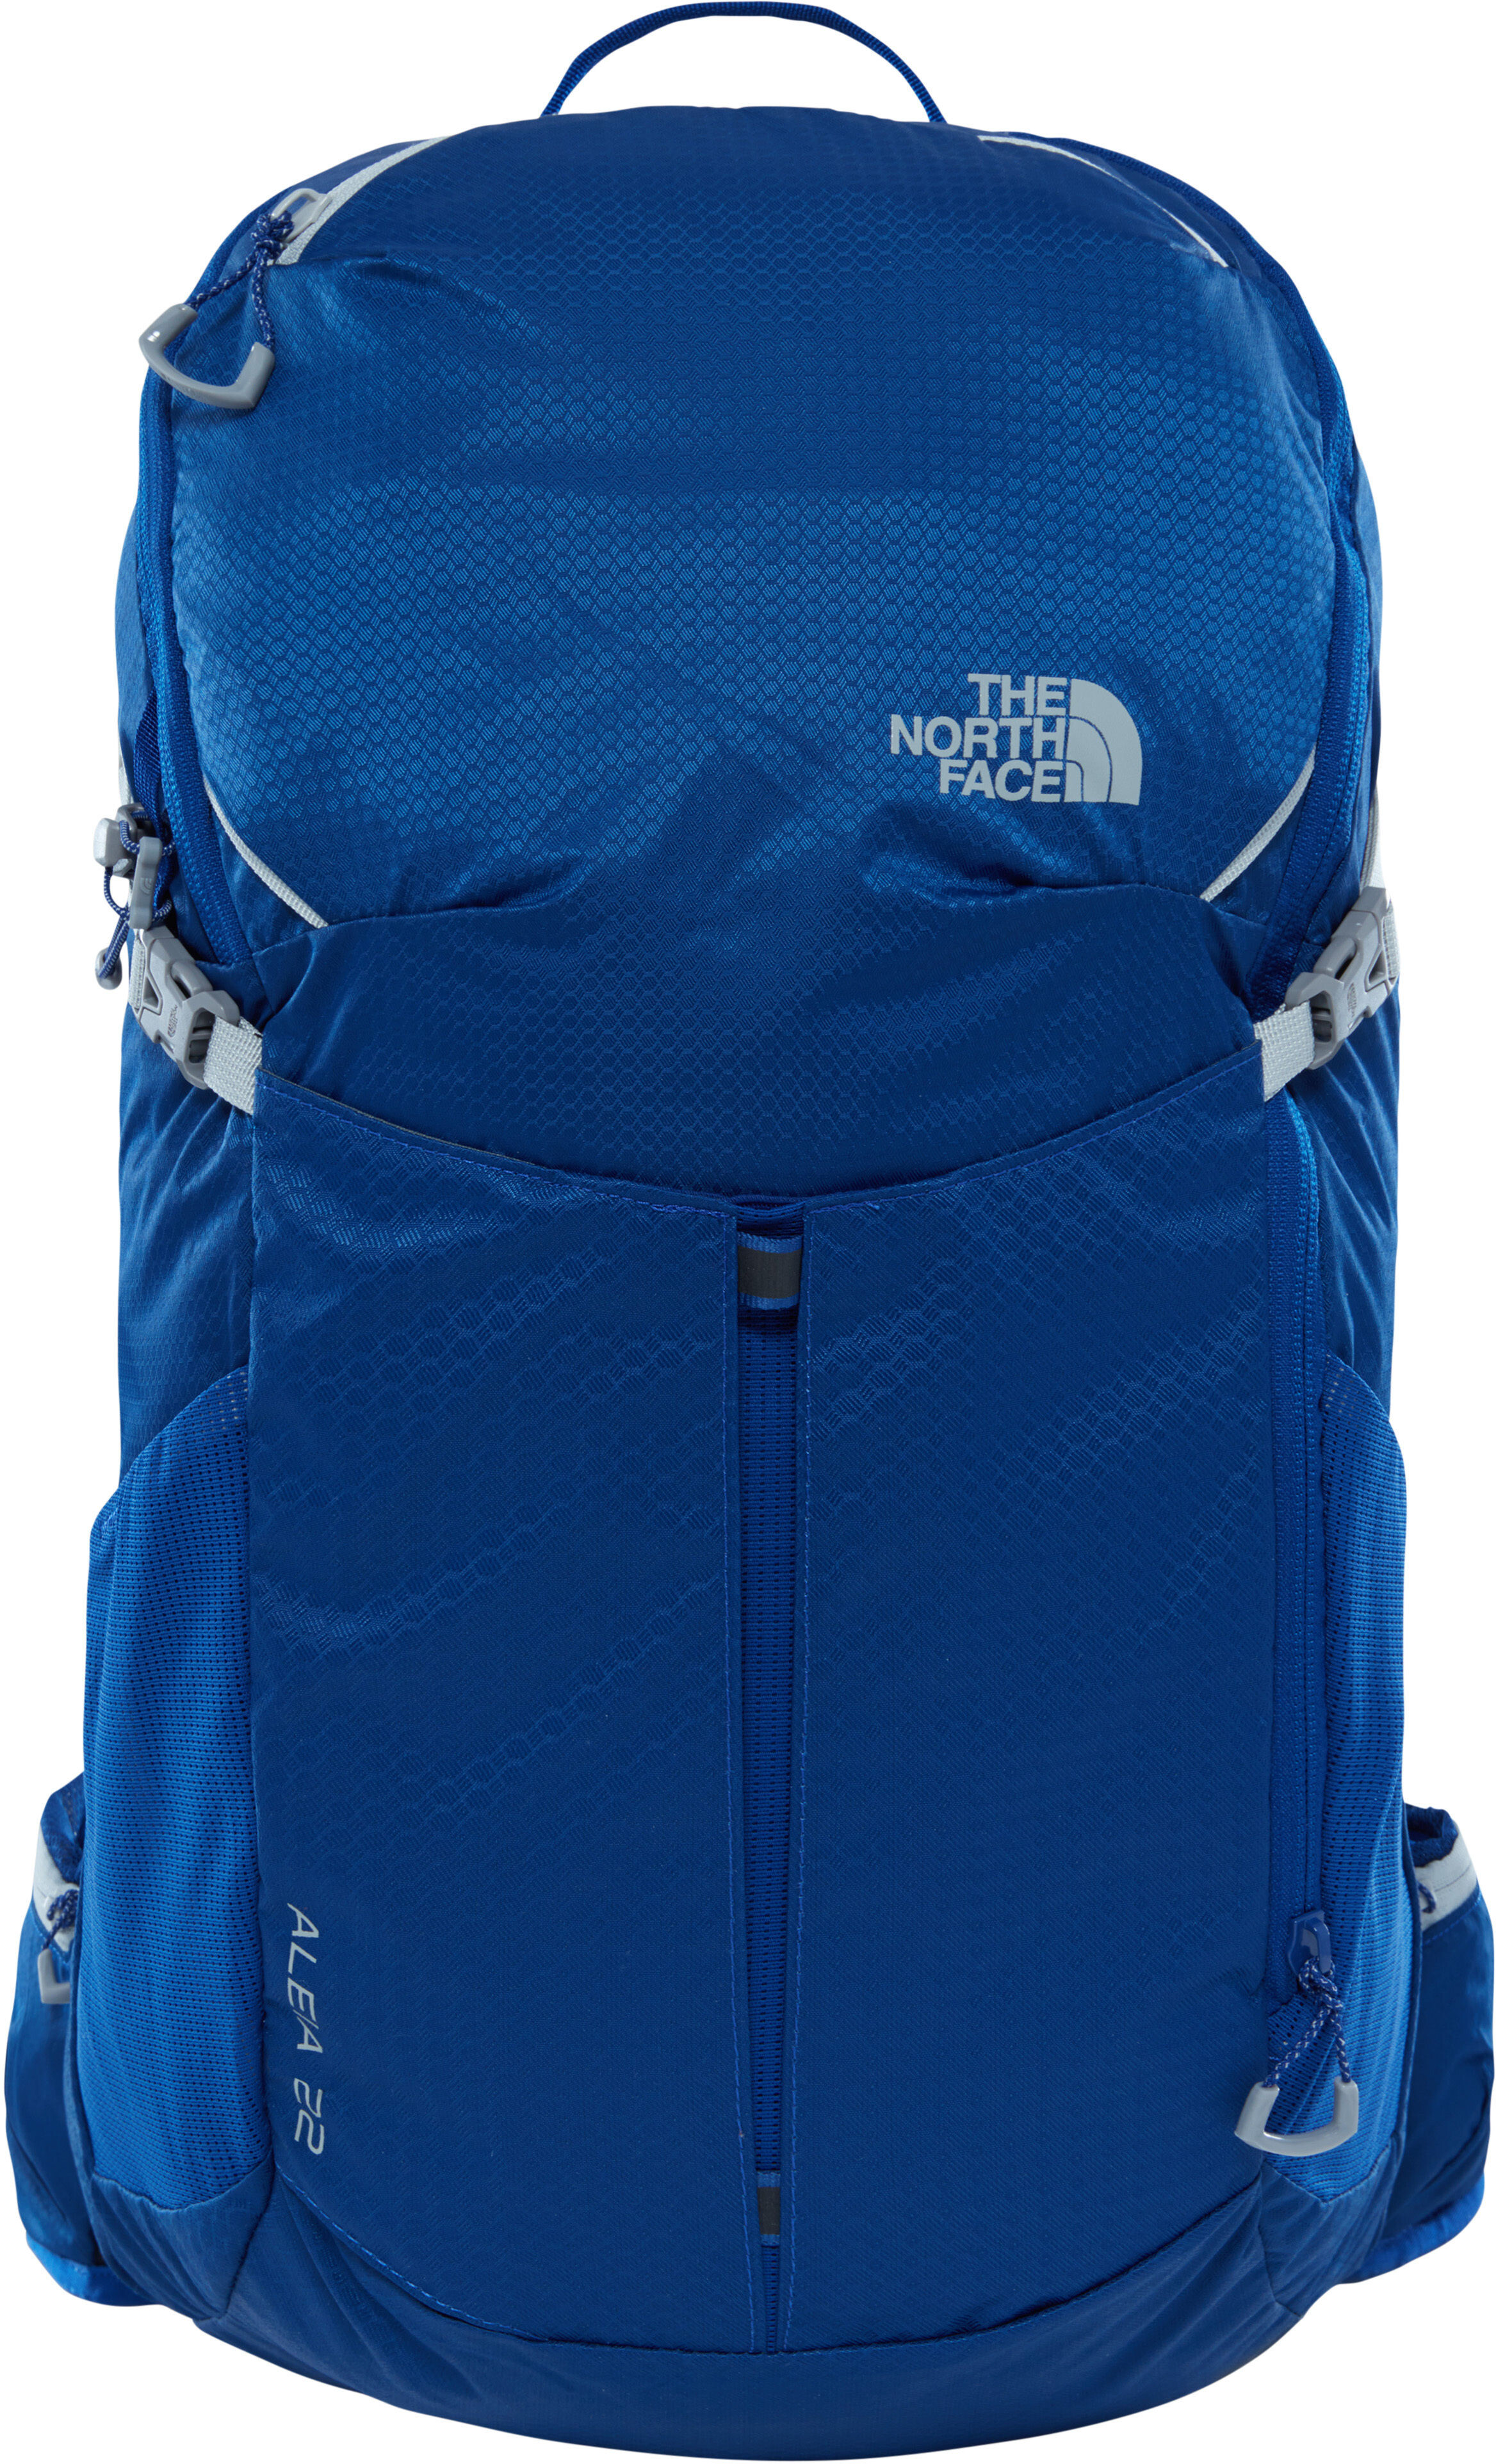 f8c61544692 The North Face Aleia 22-RC rugzak Dames blauw l Online outdoor shop ...